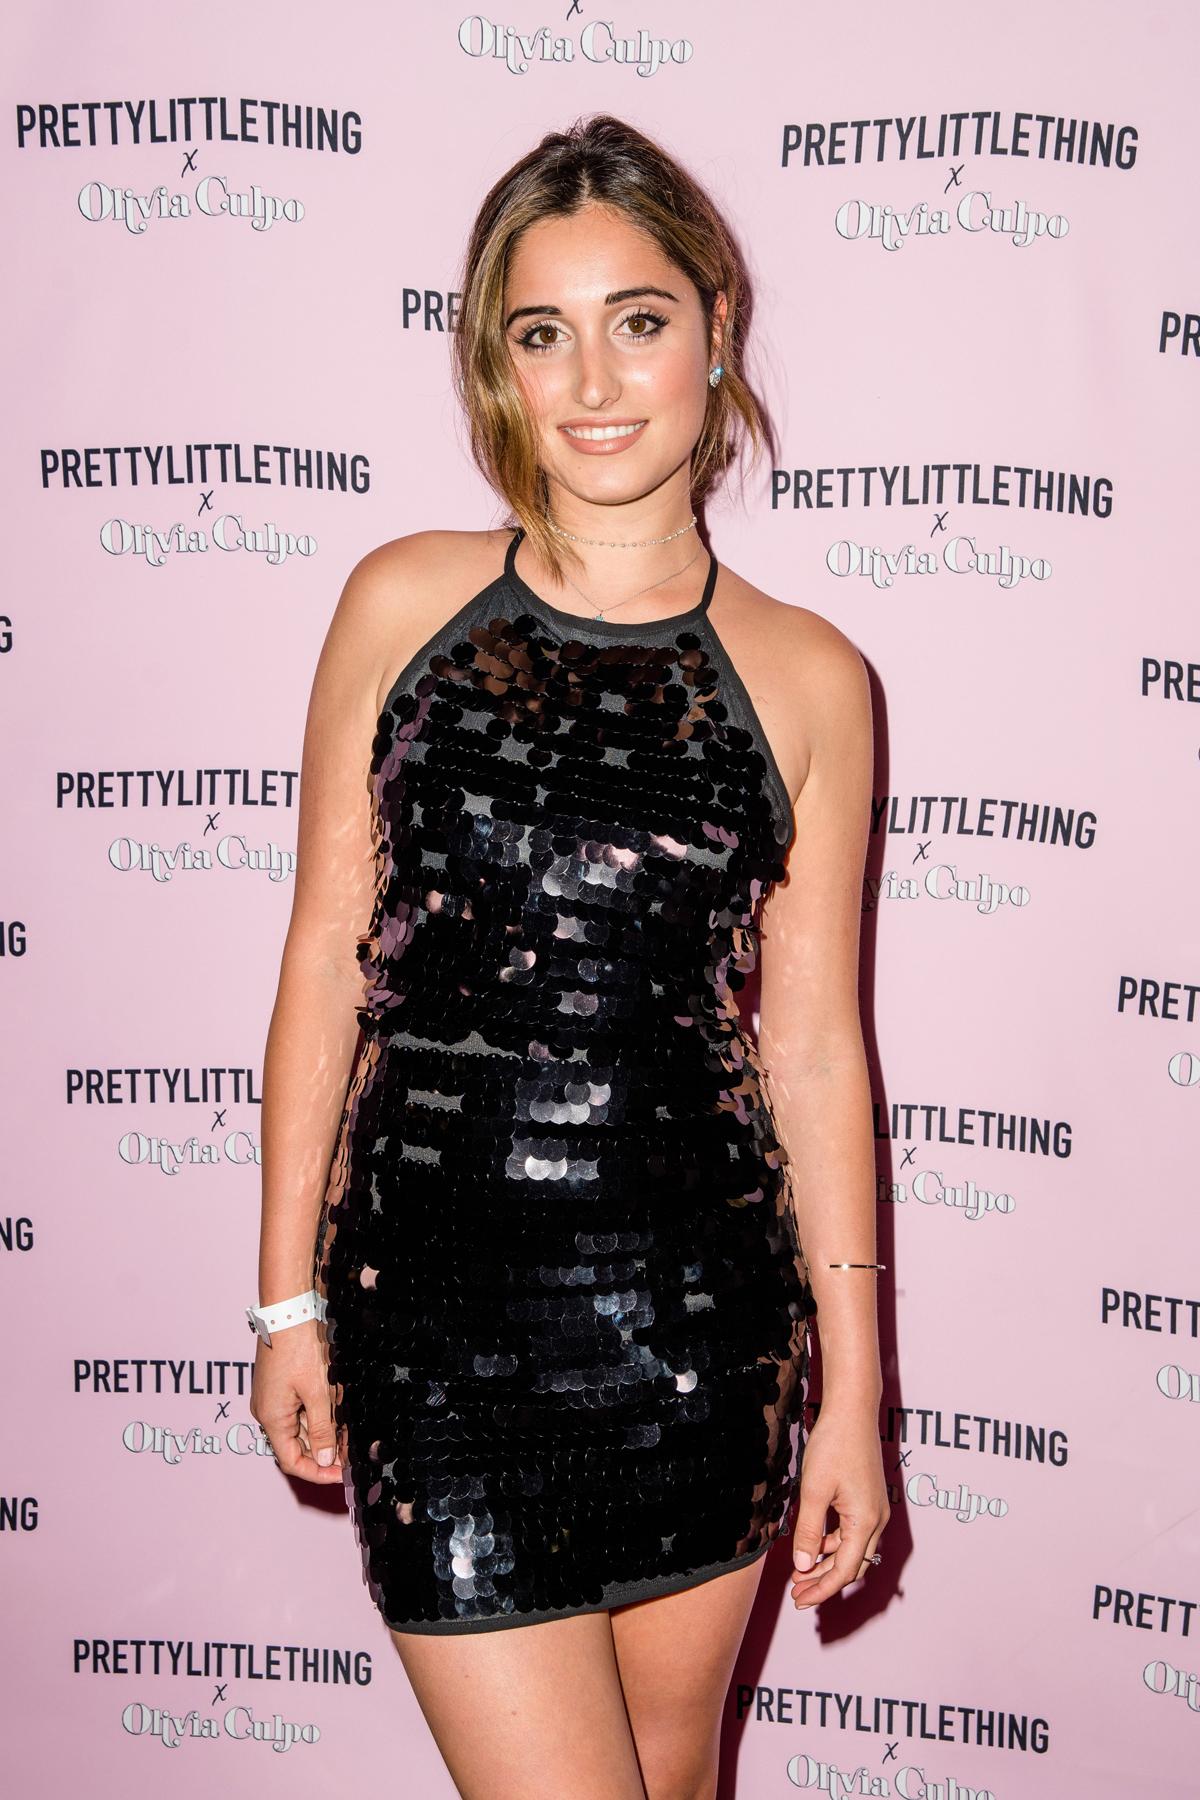 PrettyLittleThing PLT X Olivia Culpo Collection  Celebrity Launch Party Leila Pari.jpg